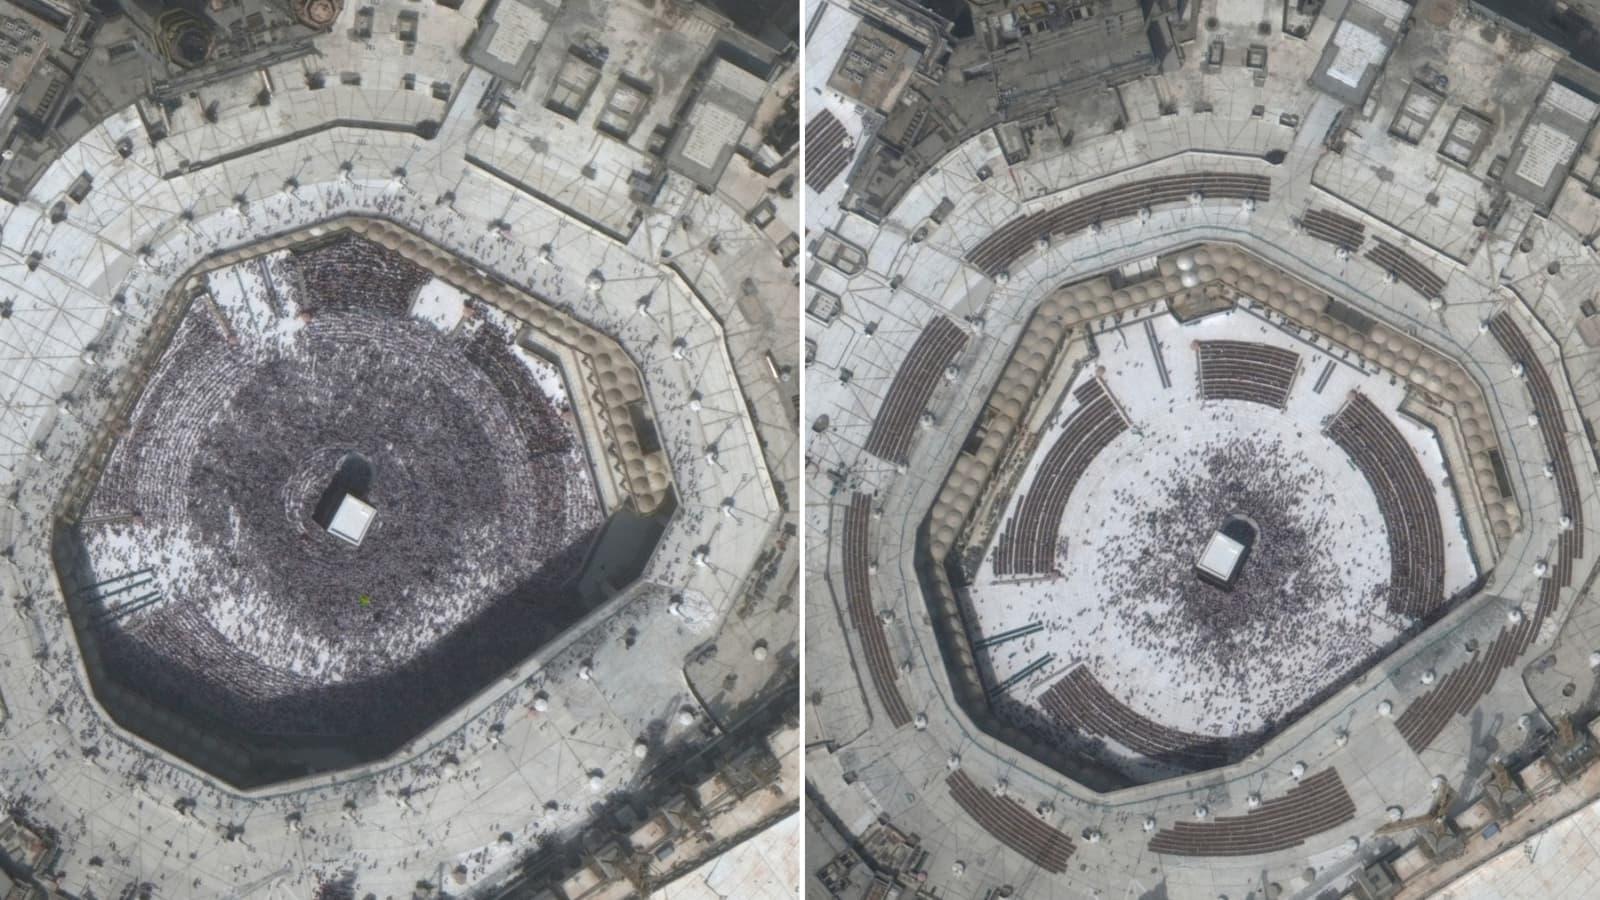 Satellite Photos Sites Around The World Deserted Due To Coronavirus